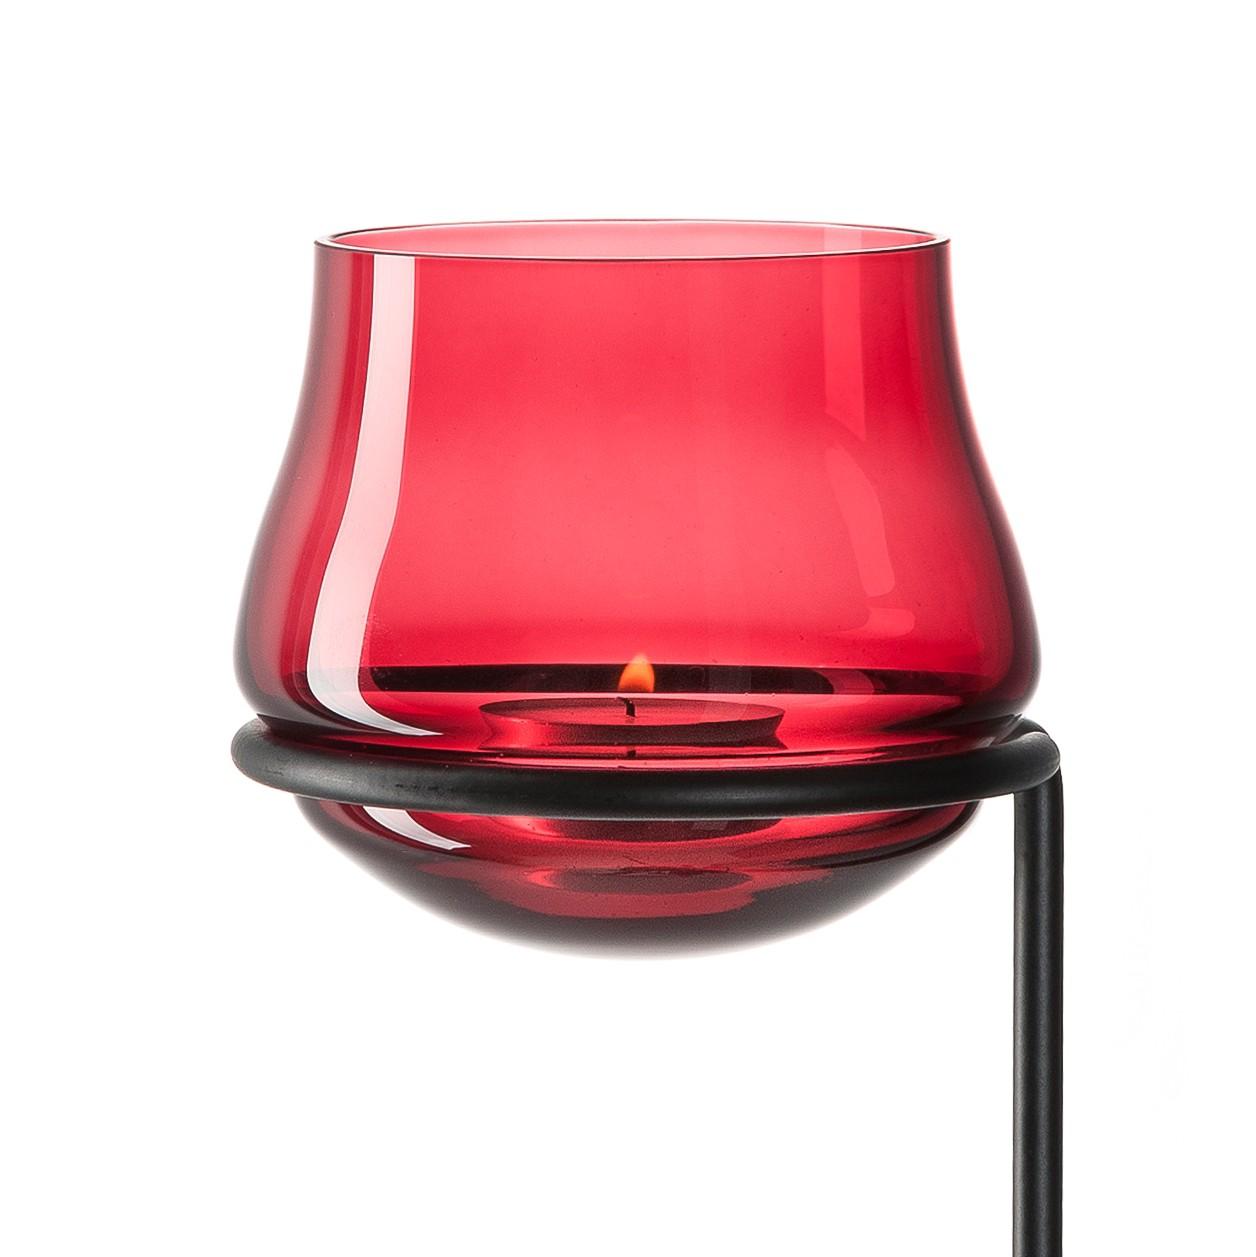 Tuinwindlicht Giardino - glas/metaal - Donkerrood/zwart, Leonardo